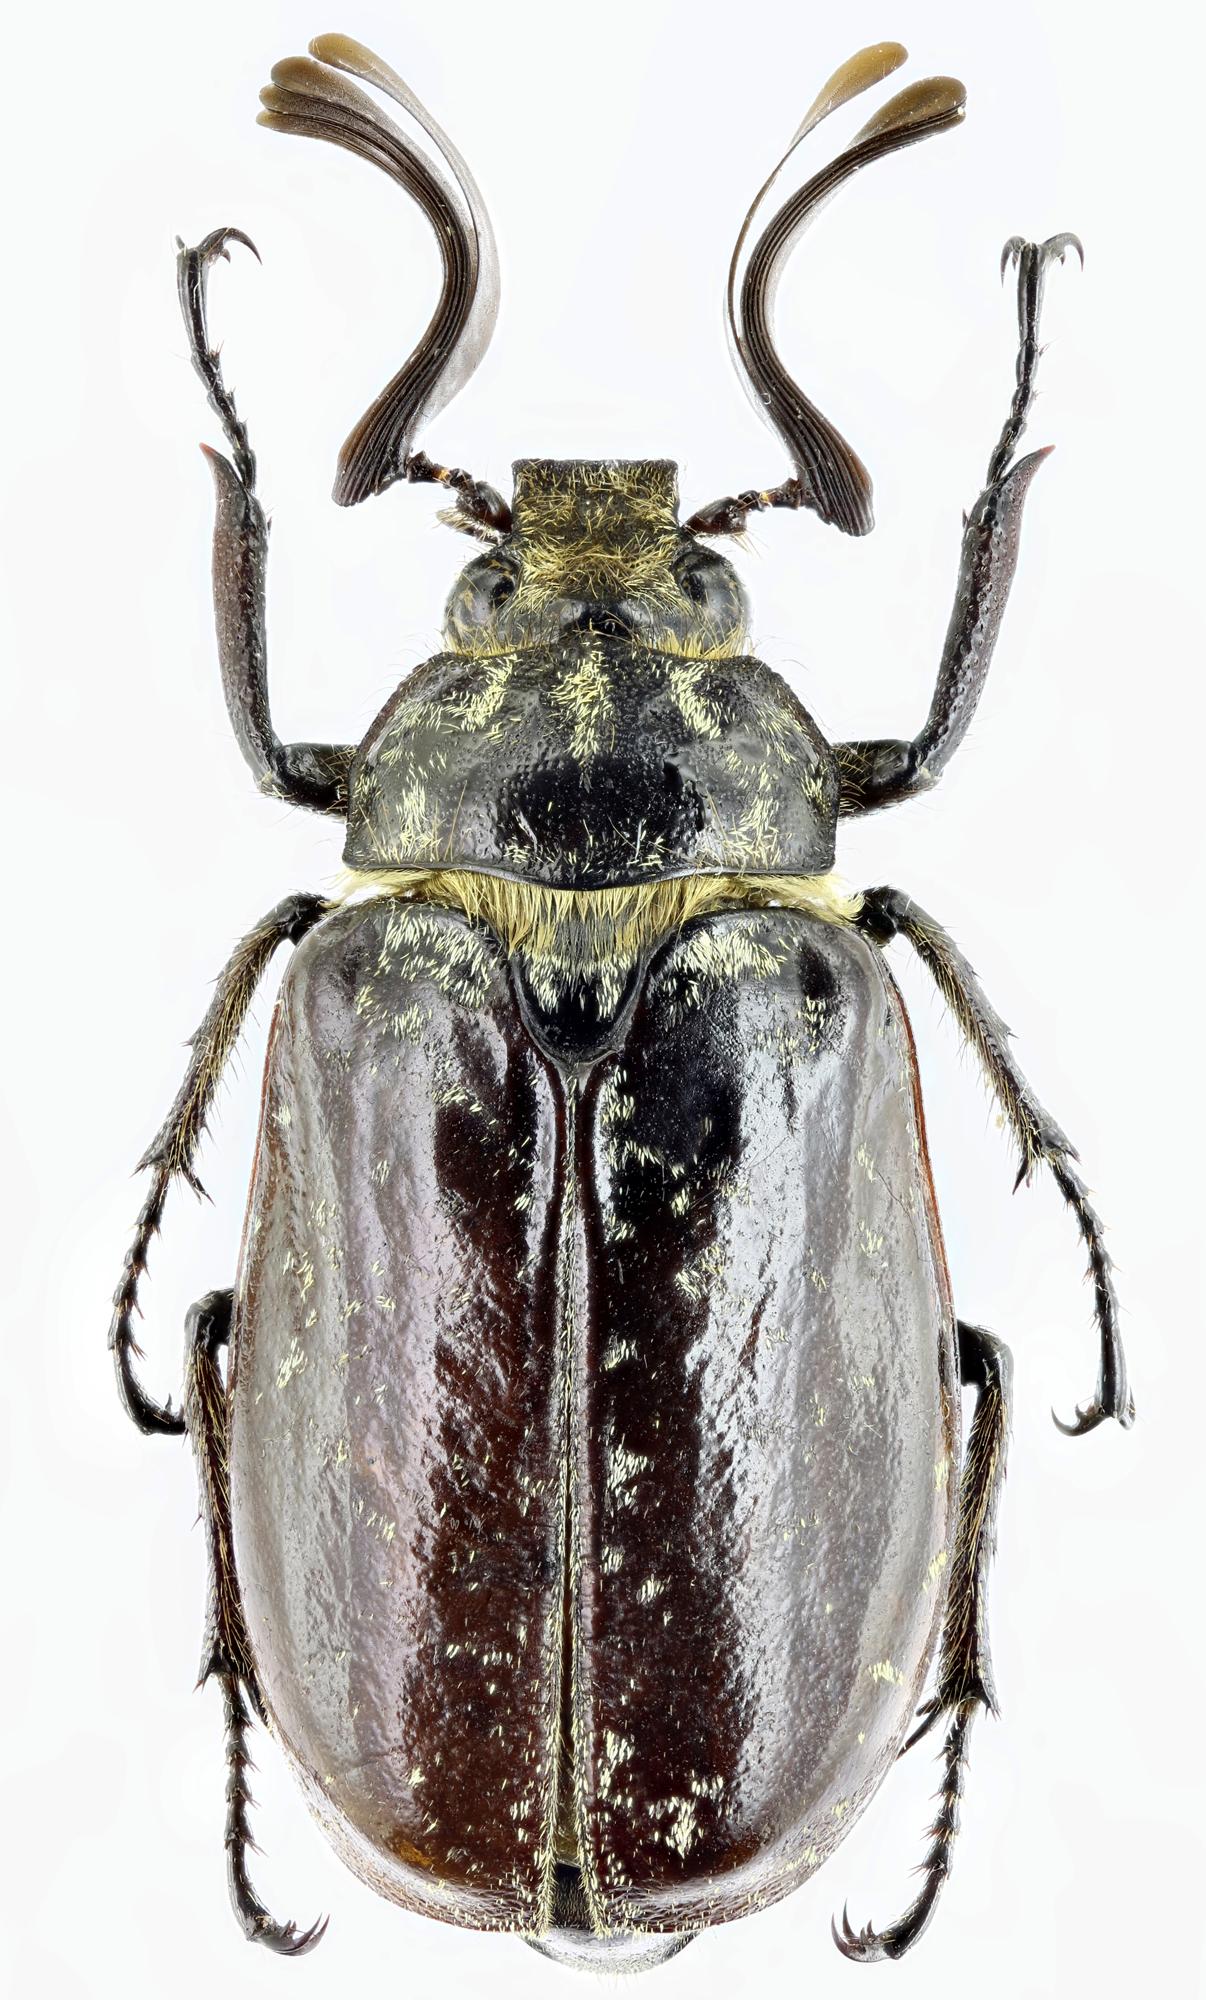 Polyphylla (Gynexophylla) gracilicornis gracilicornis 26442zs54.jpg